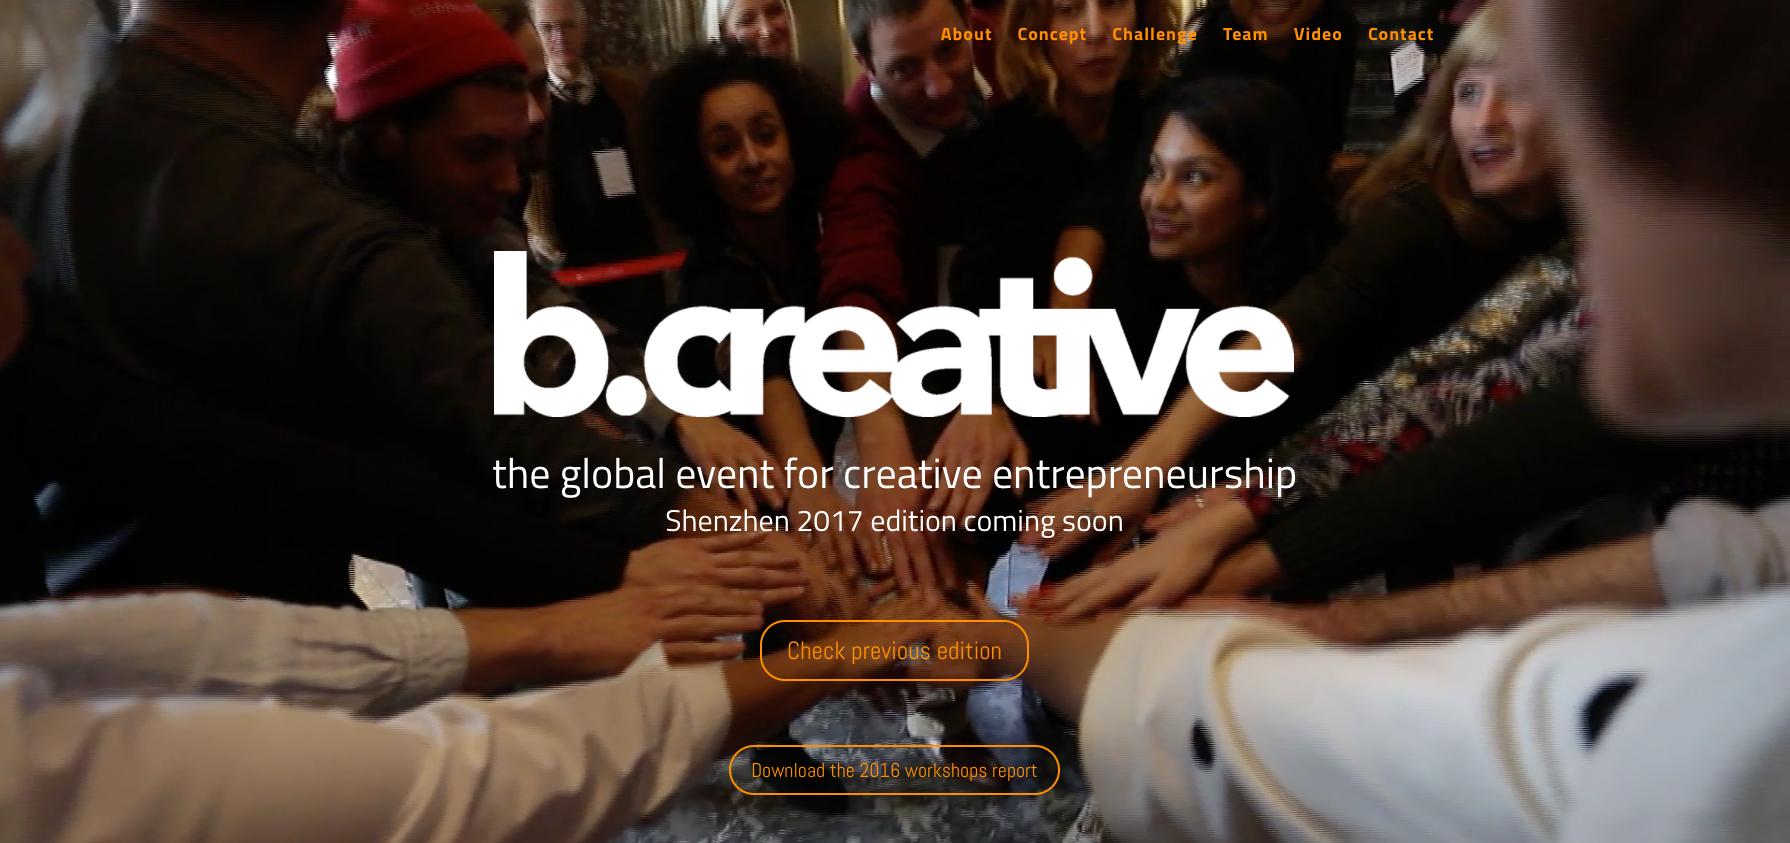 15/11/2017, b.creative conference, Shanghai, China